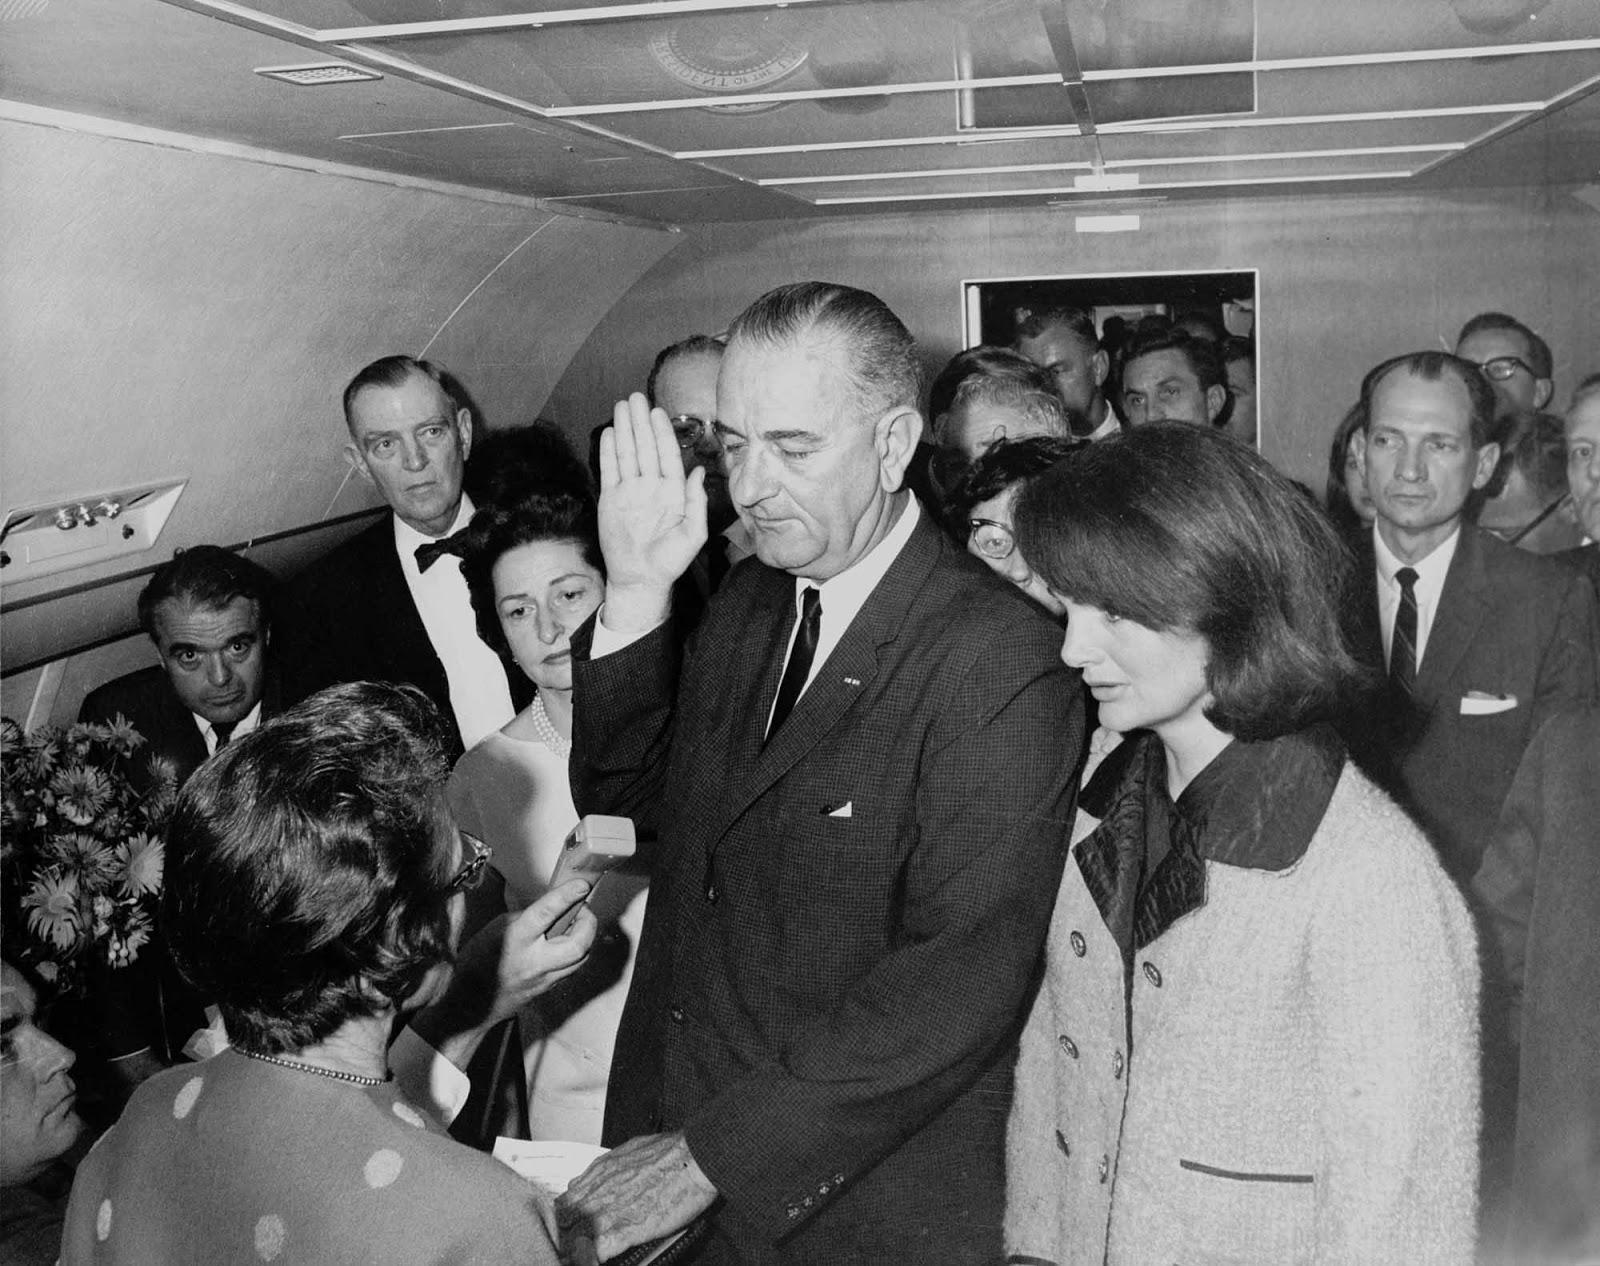 Lyndon_B_Johnson_taking_the_oath_of_office_1